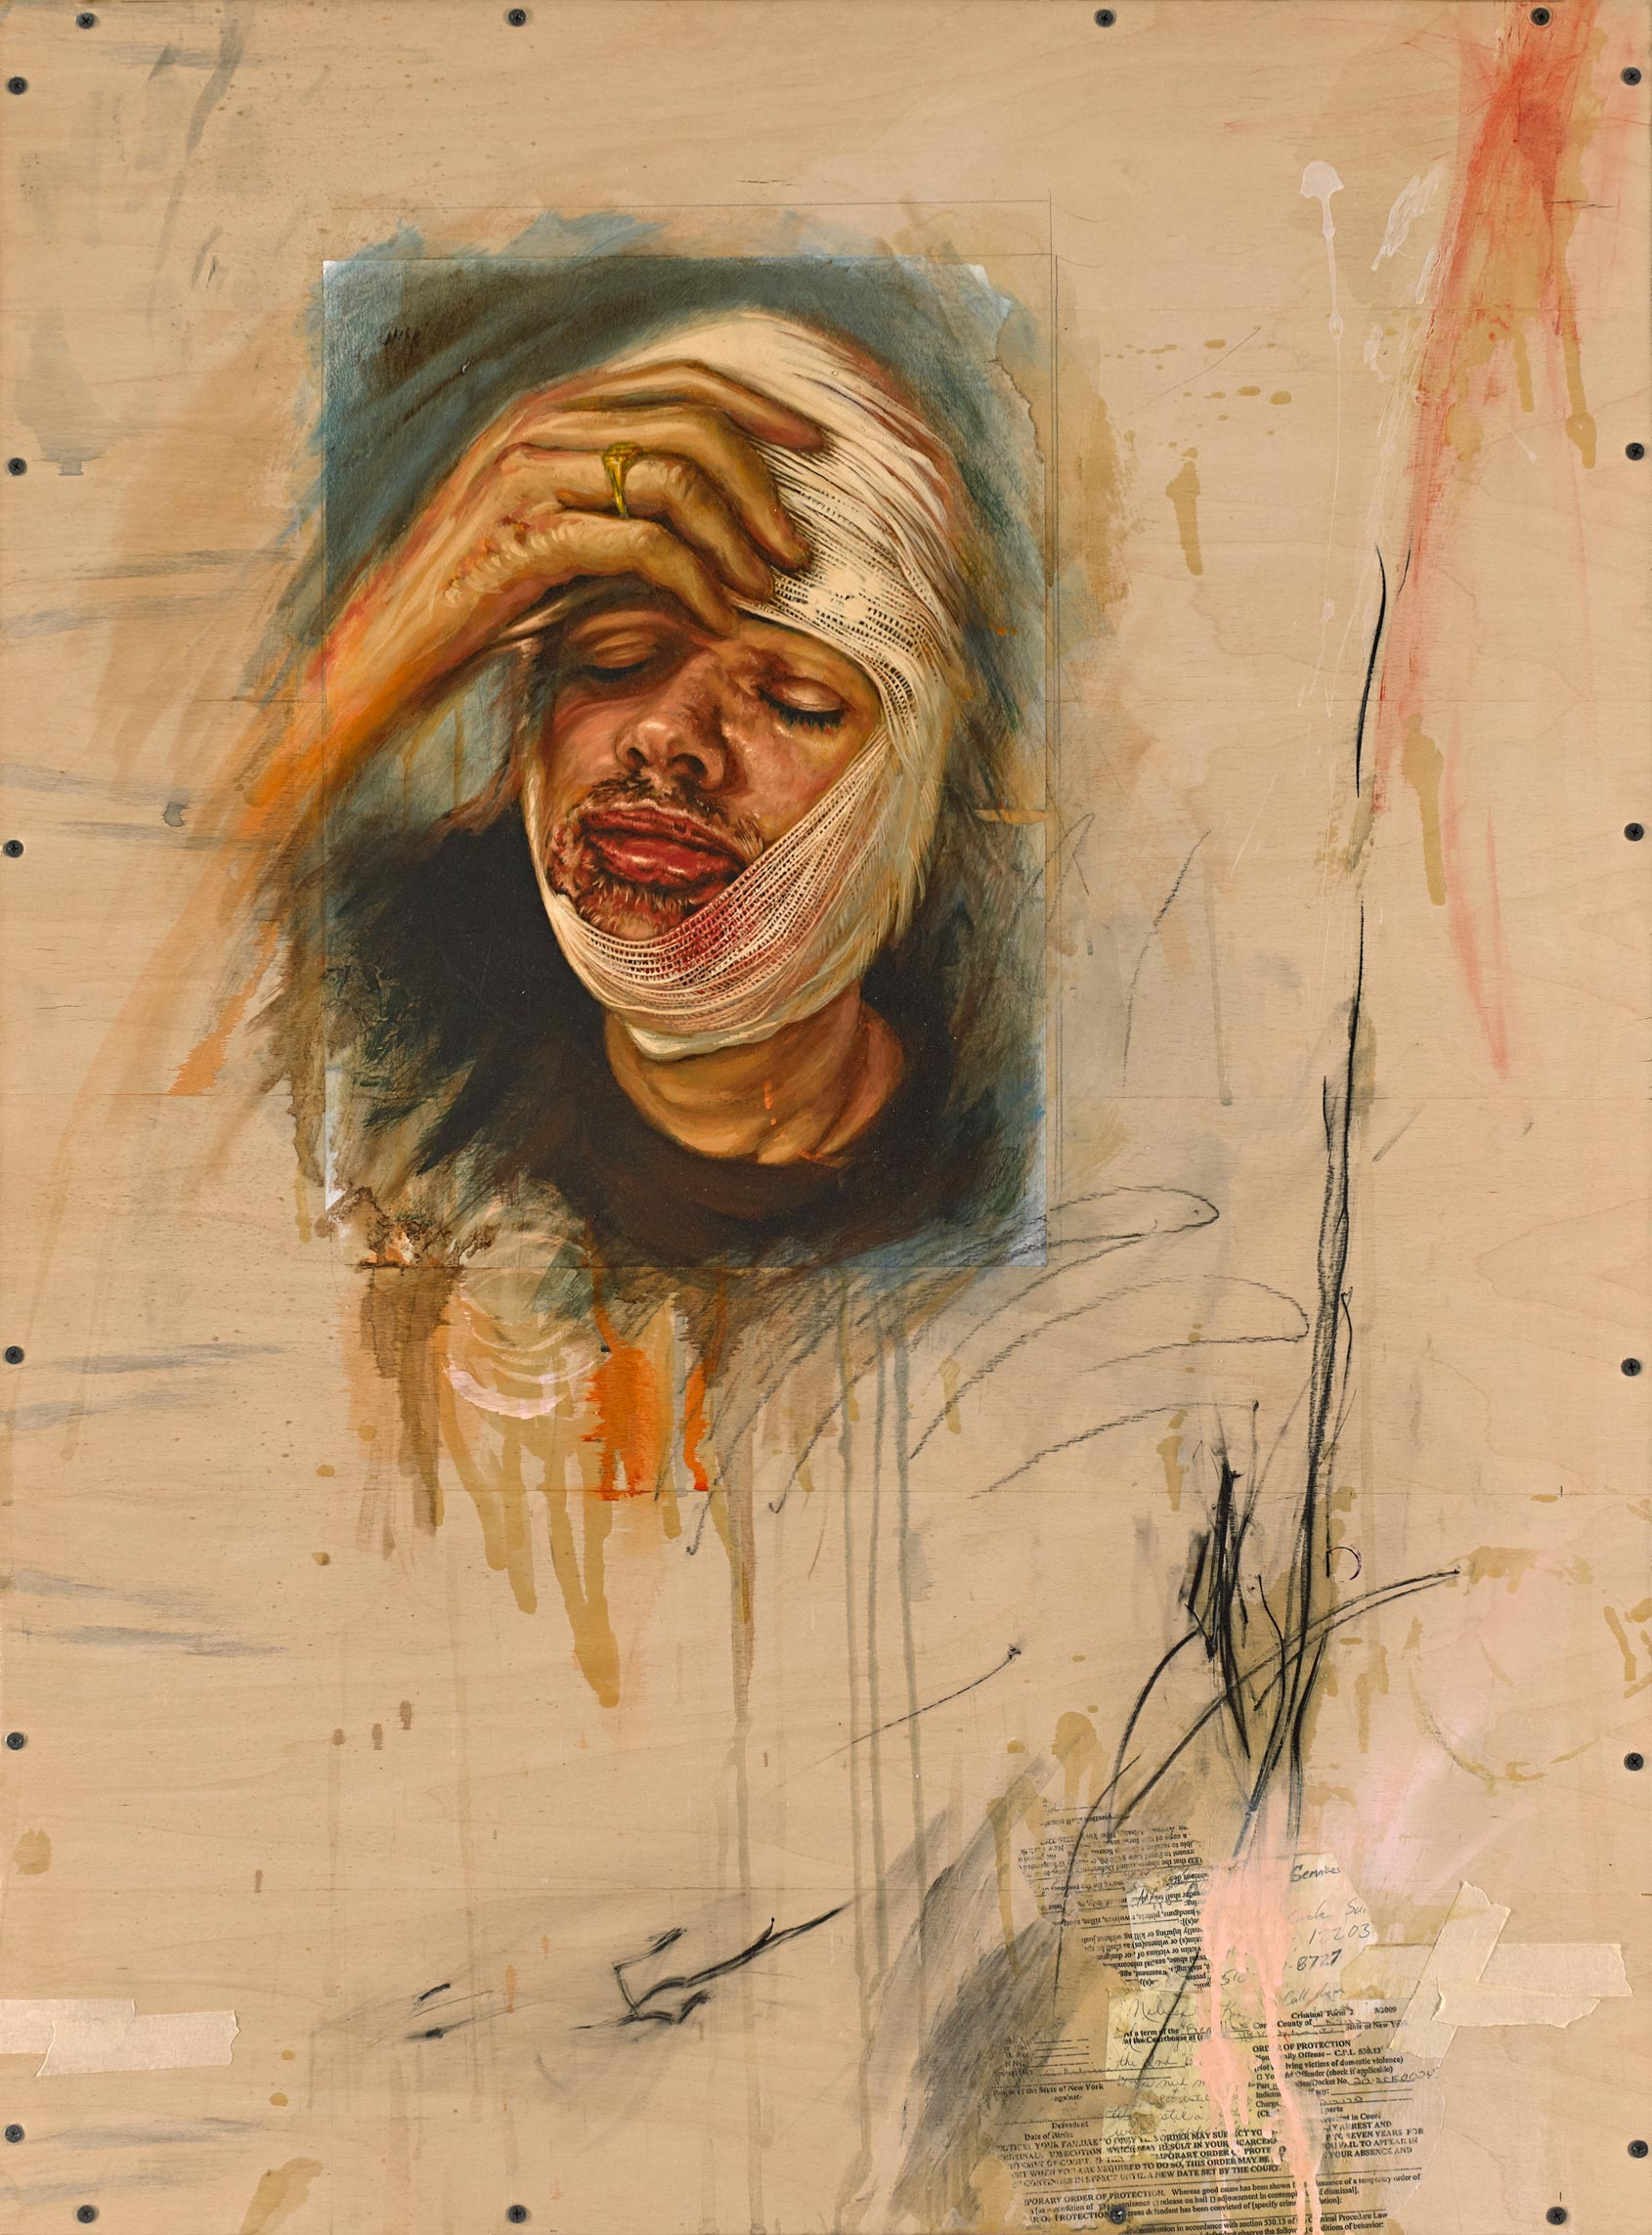 Broken Face Portrait  Mixed Media on Wood Panel 30in x 40in